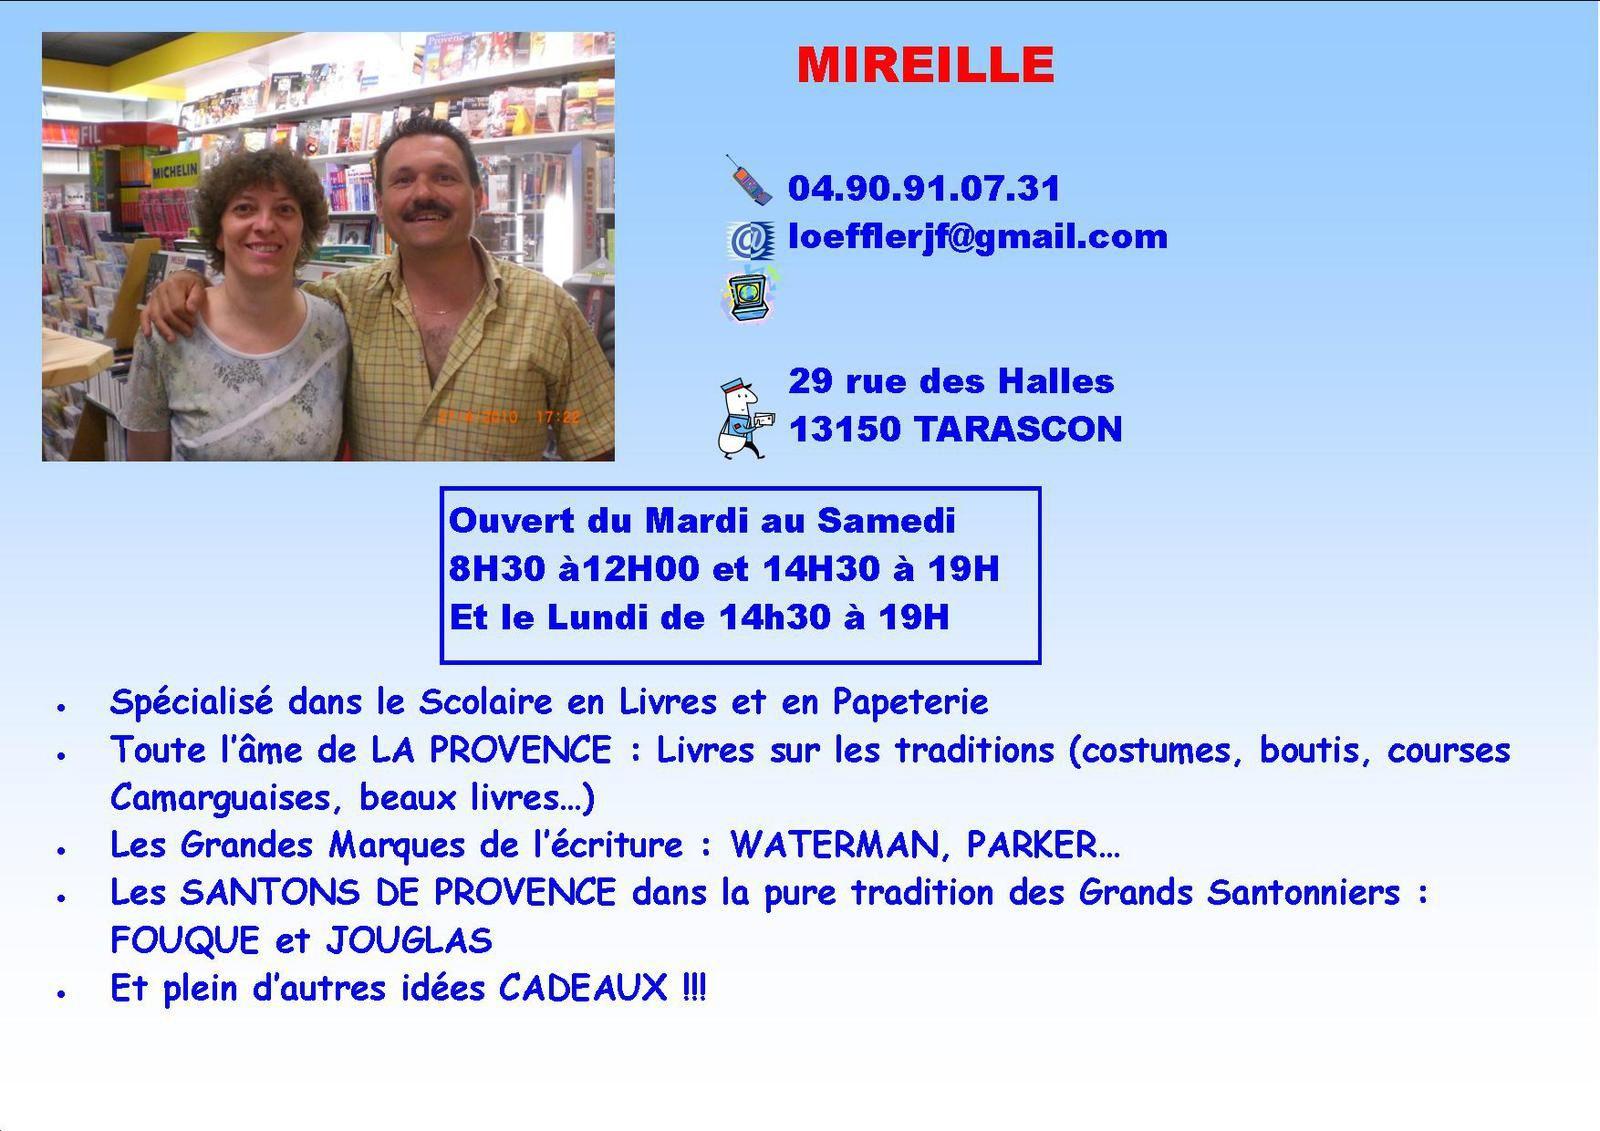 La Librairie Mireille à Tarascon